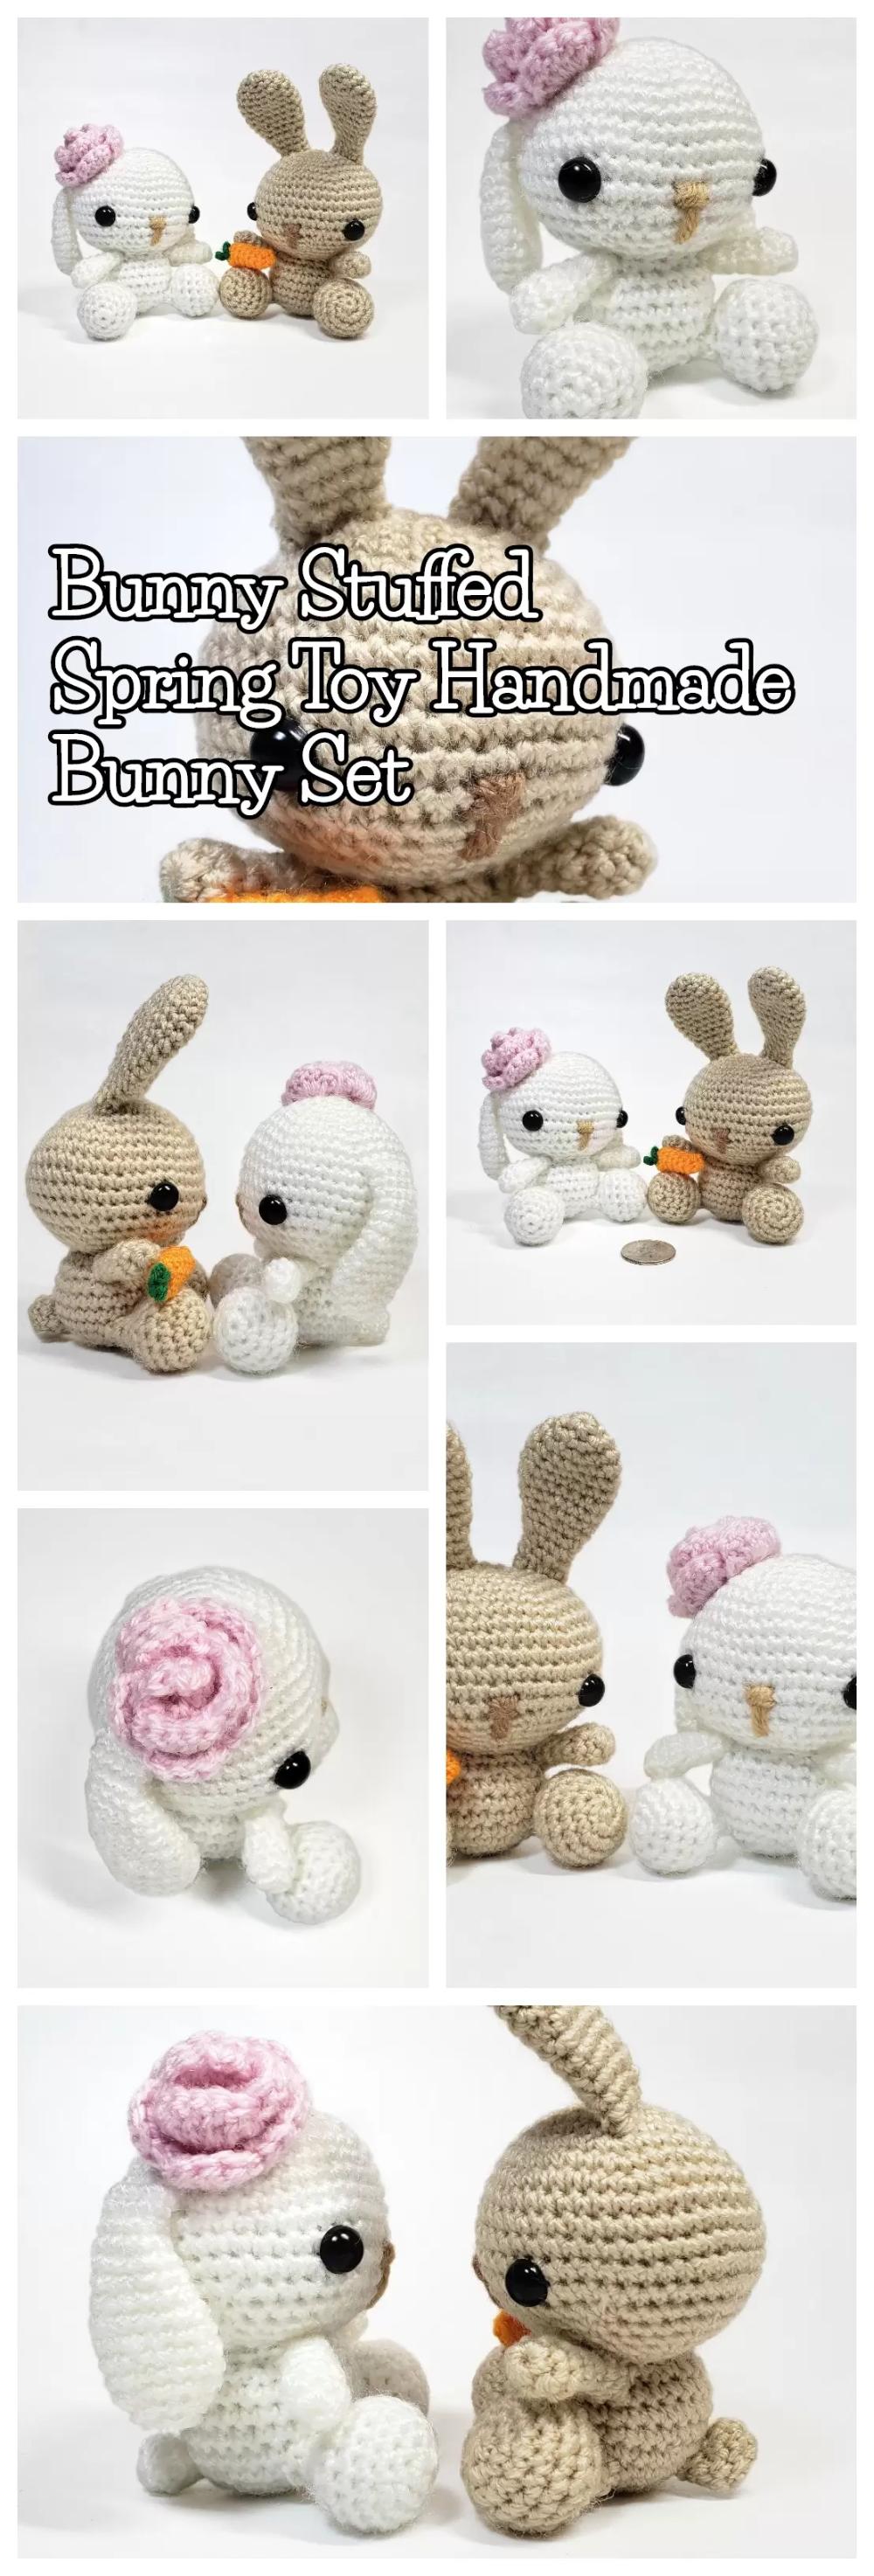 Bunny Stuffed Spring Toy Handmade Bunny Set Stitch.Live